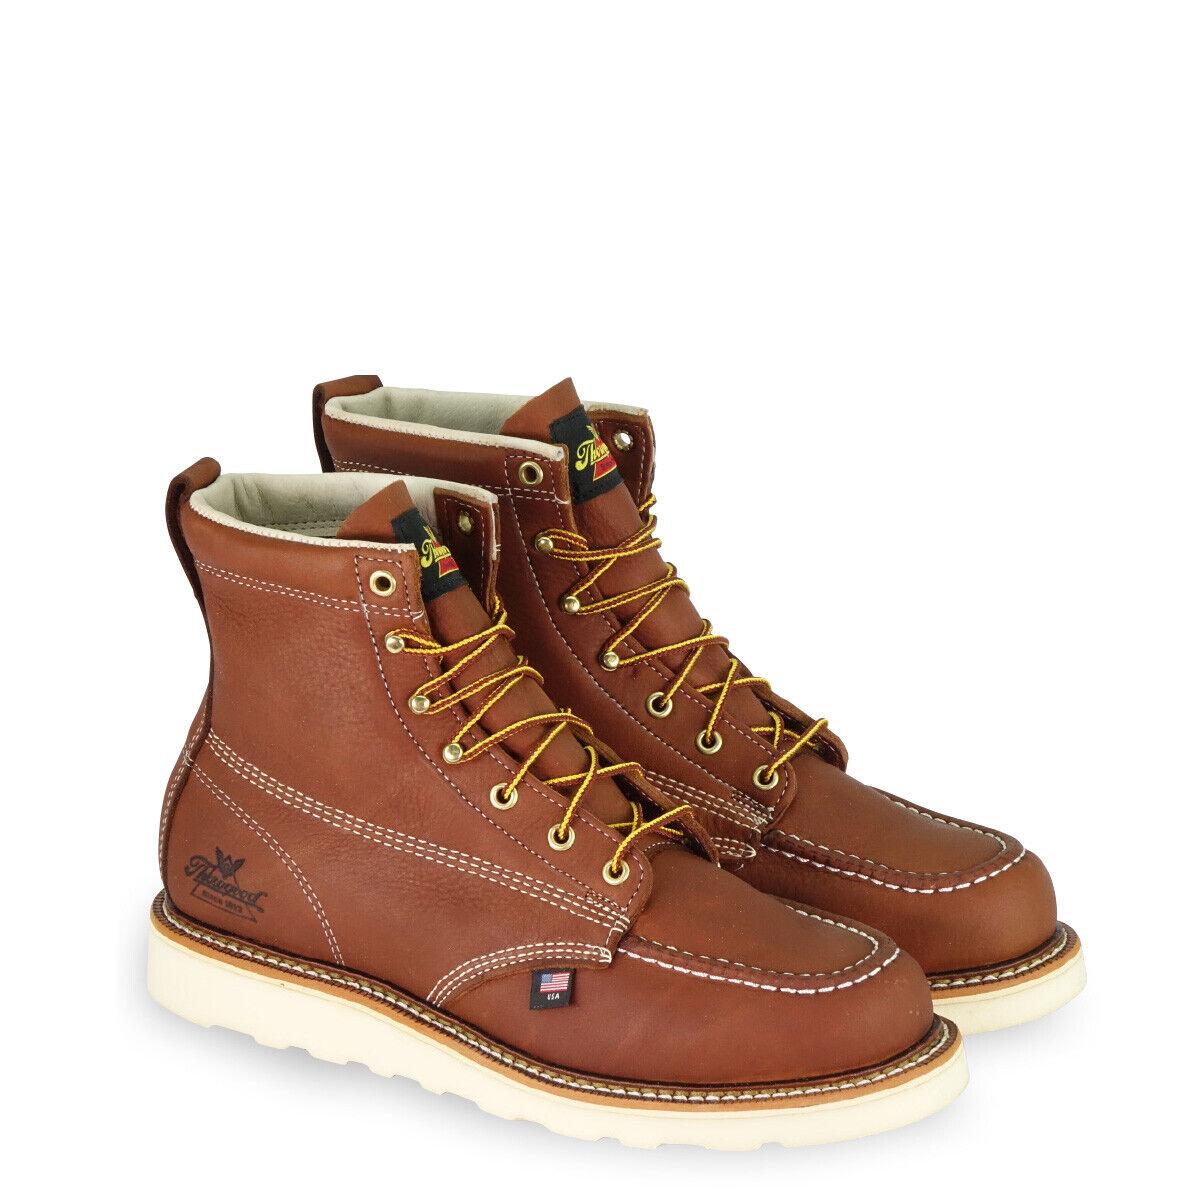 ThGoldgood 804-4200 Heritage Sicherheits Mokassin Zeh Stiefel (6   Stahl Zeh,    | Clearance Sale